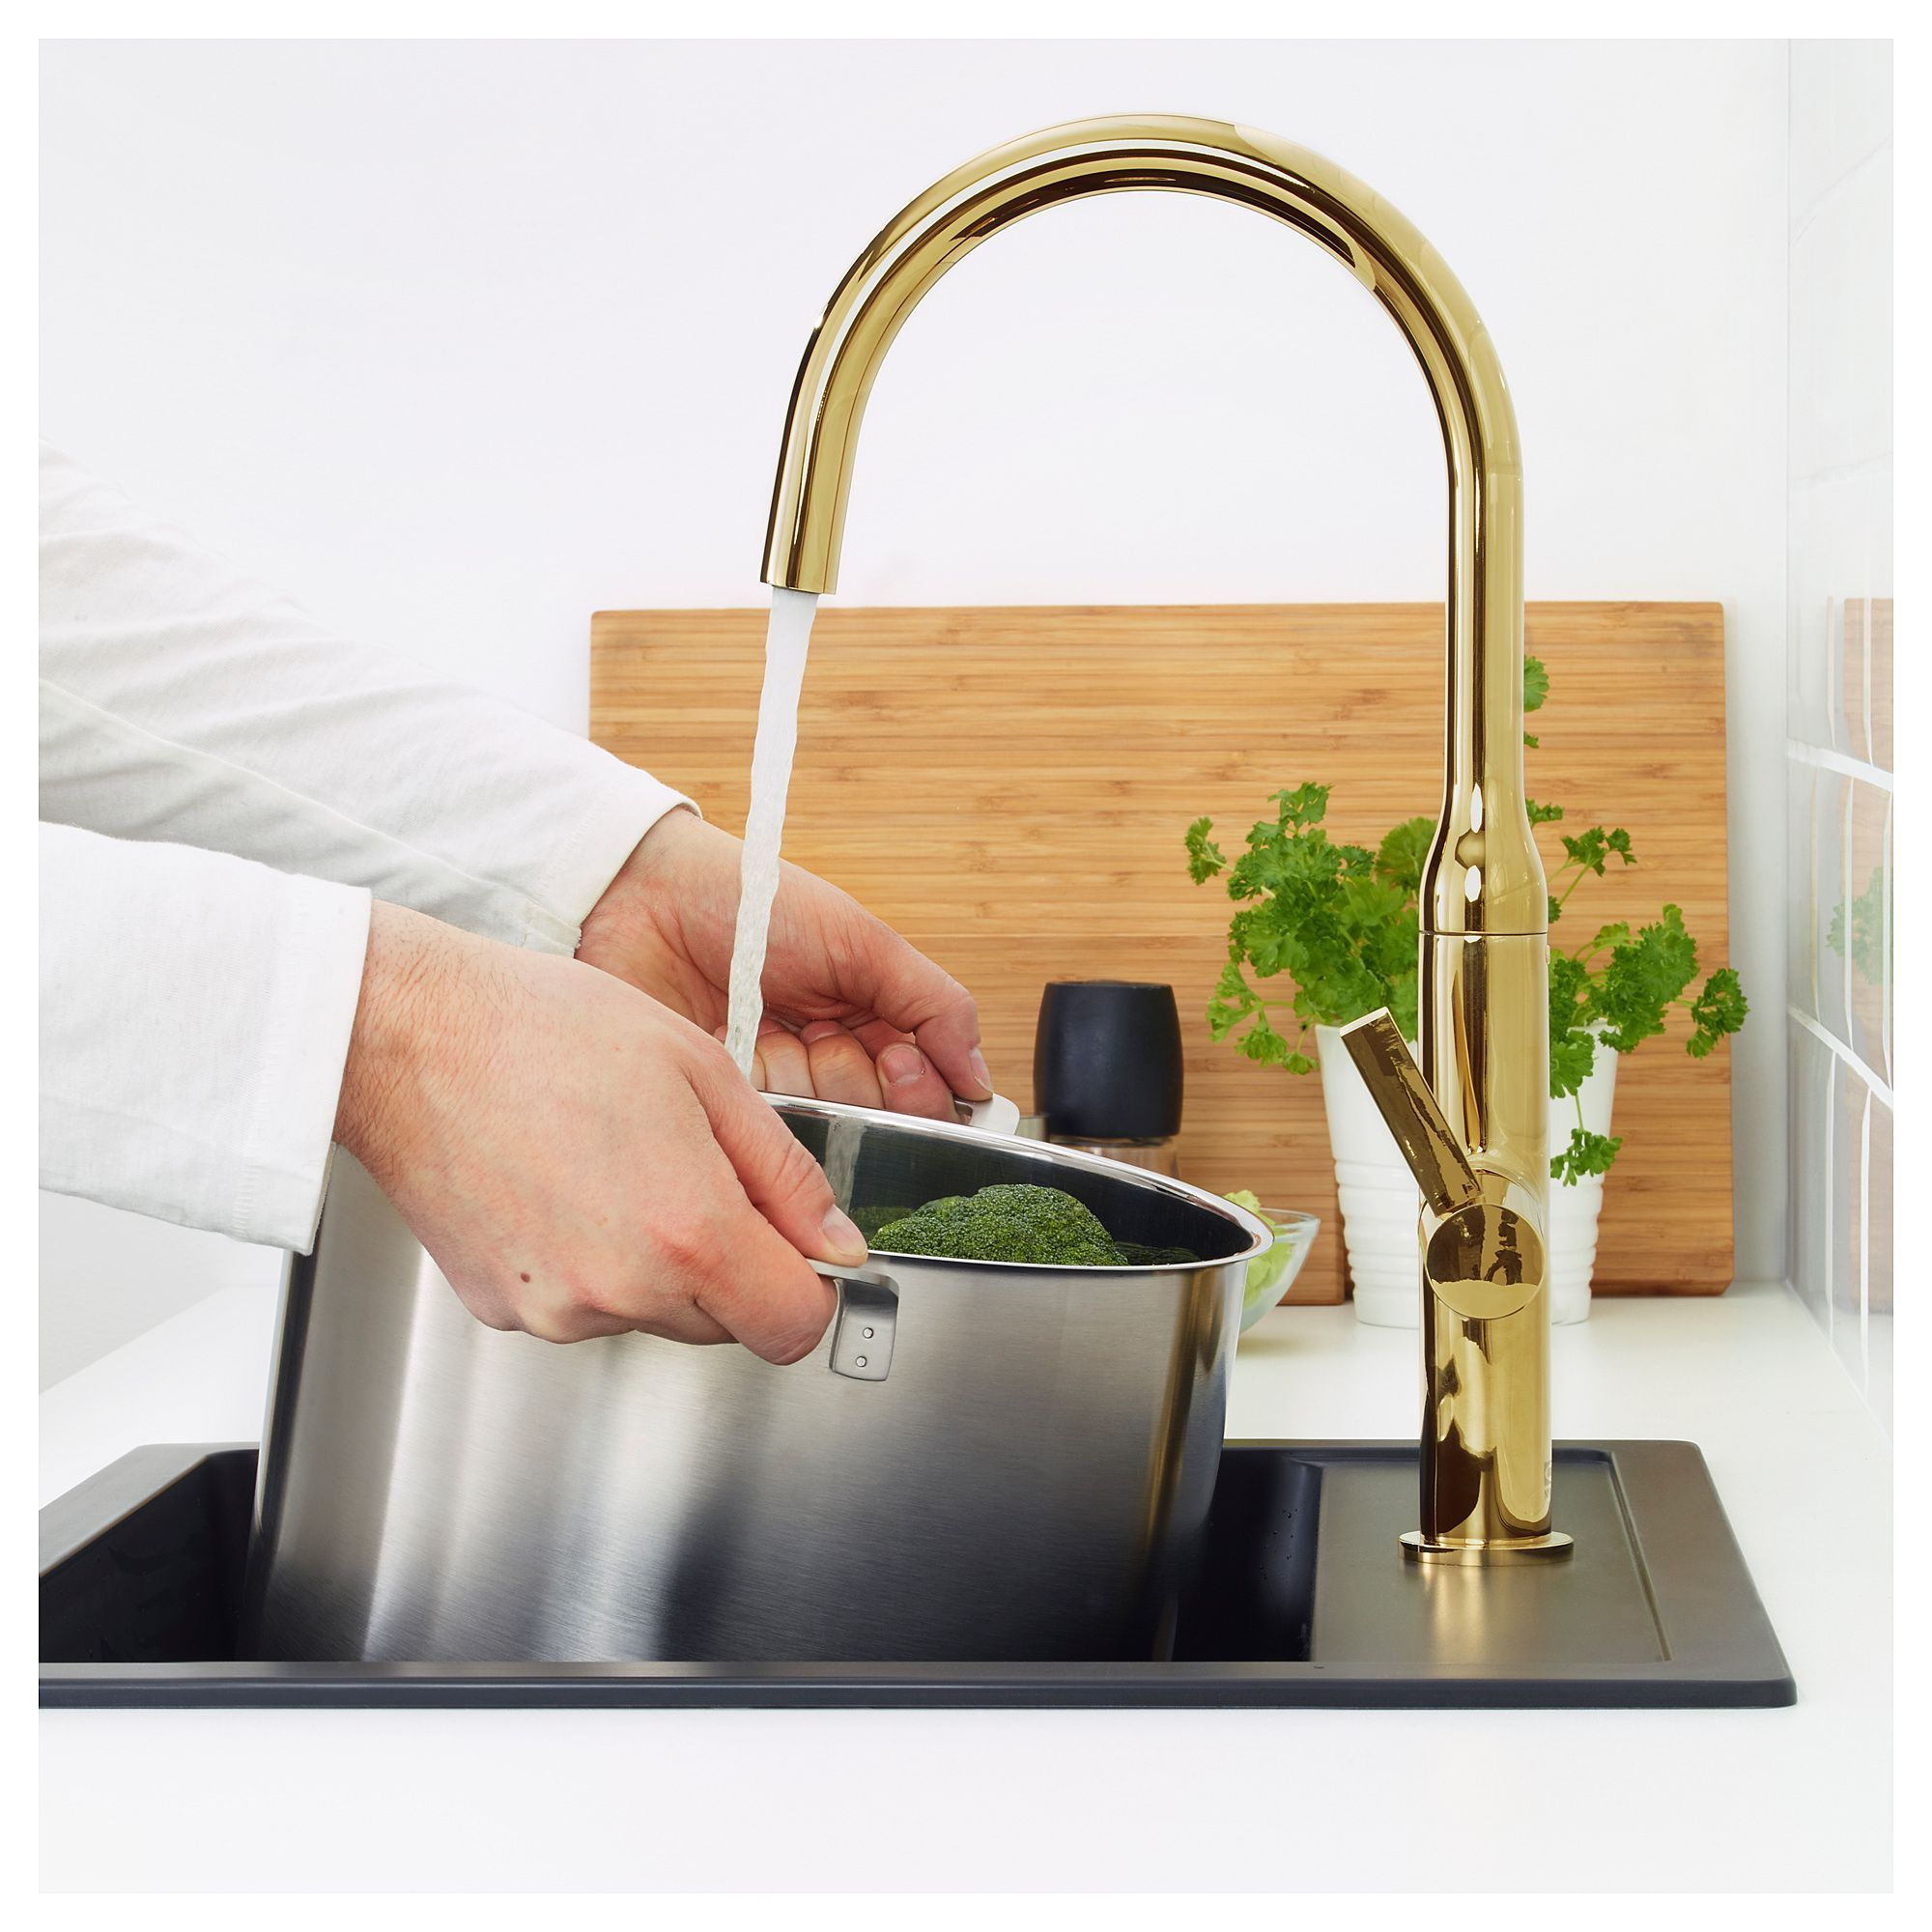 Ikea Nyvattnet Kitchen Faucet Polished Brass Color Kitchen Faucet Kitchen Mixer Taps Kitchen Taps